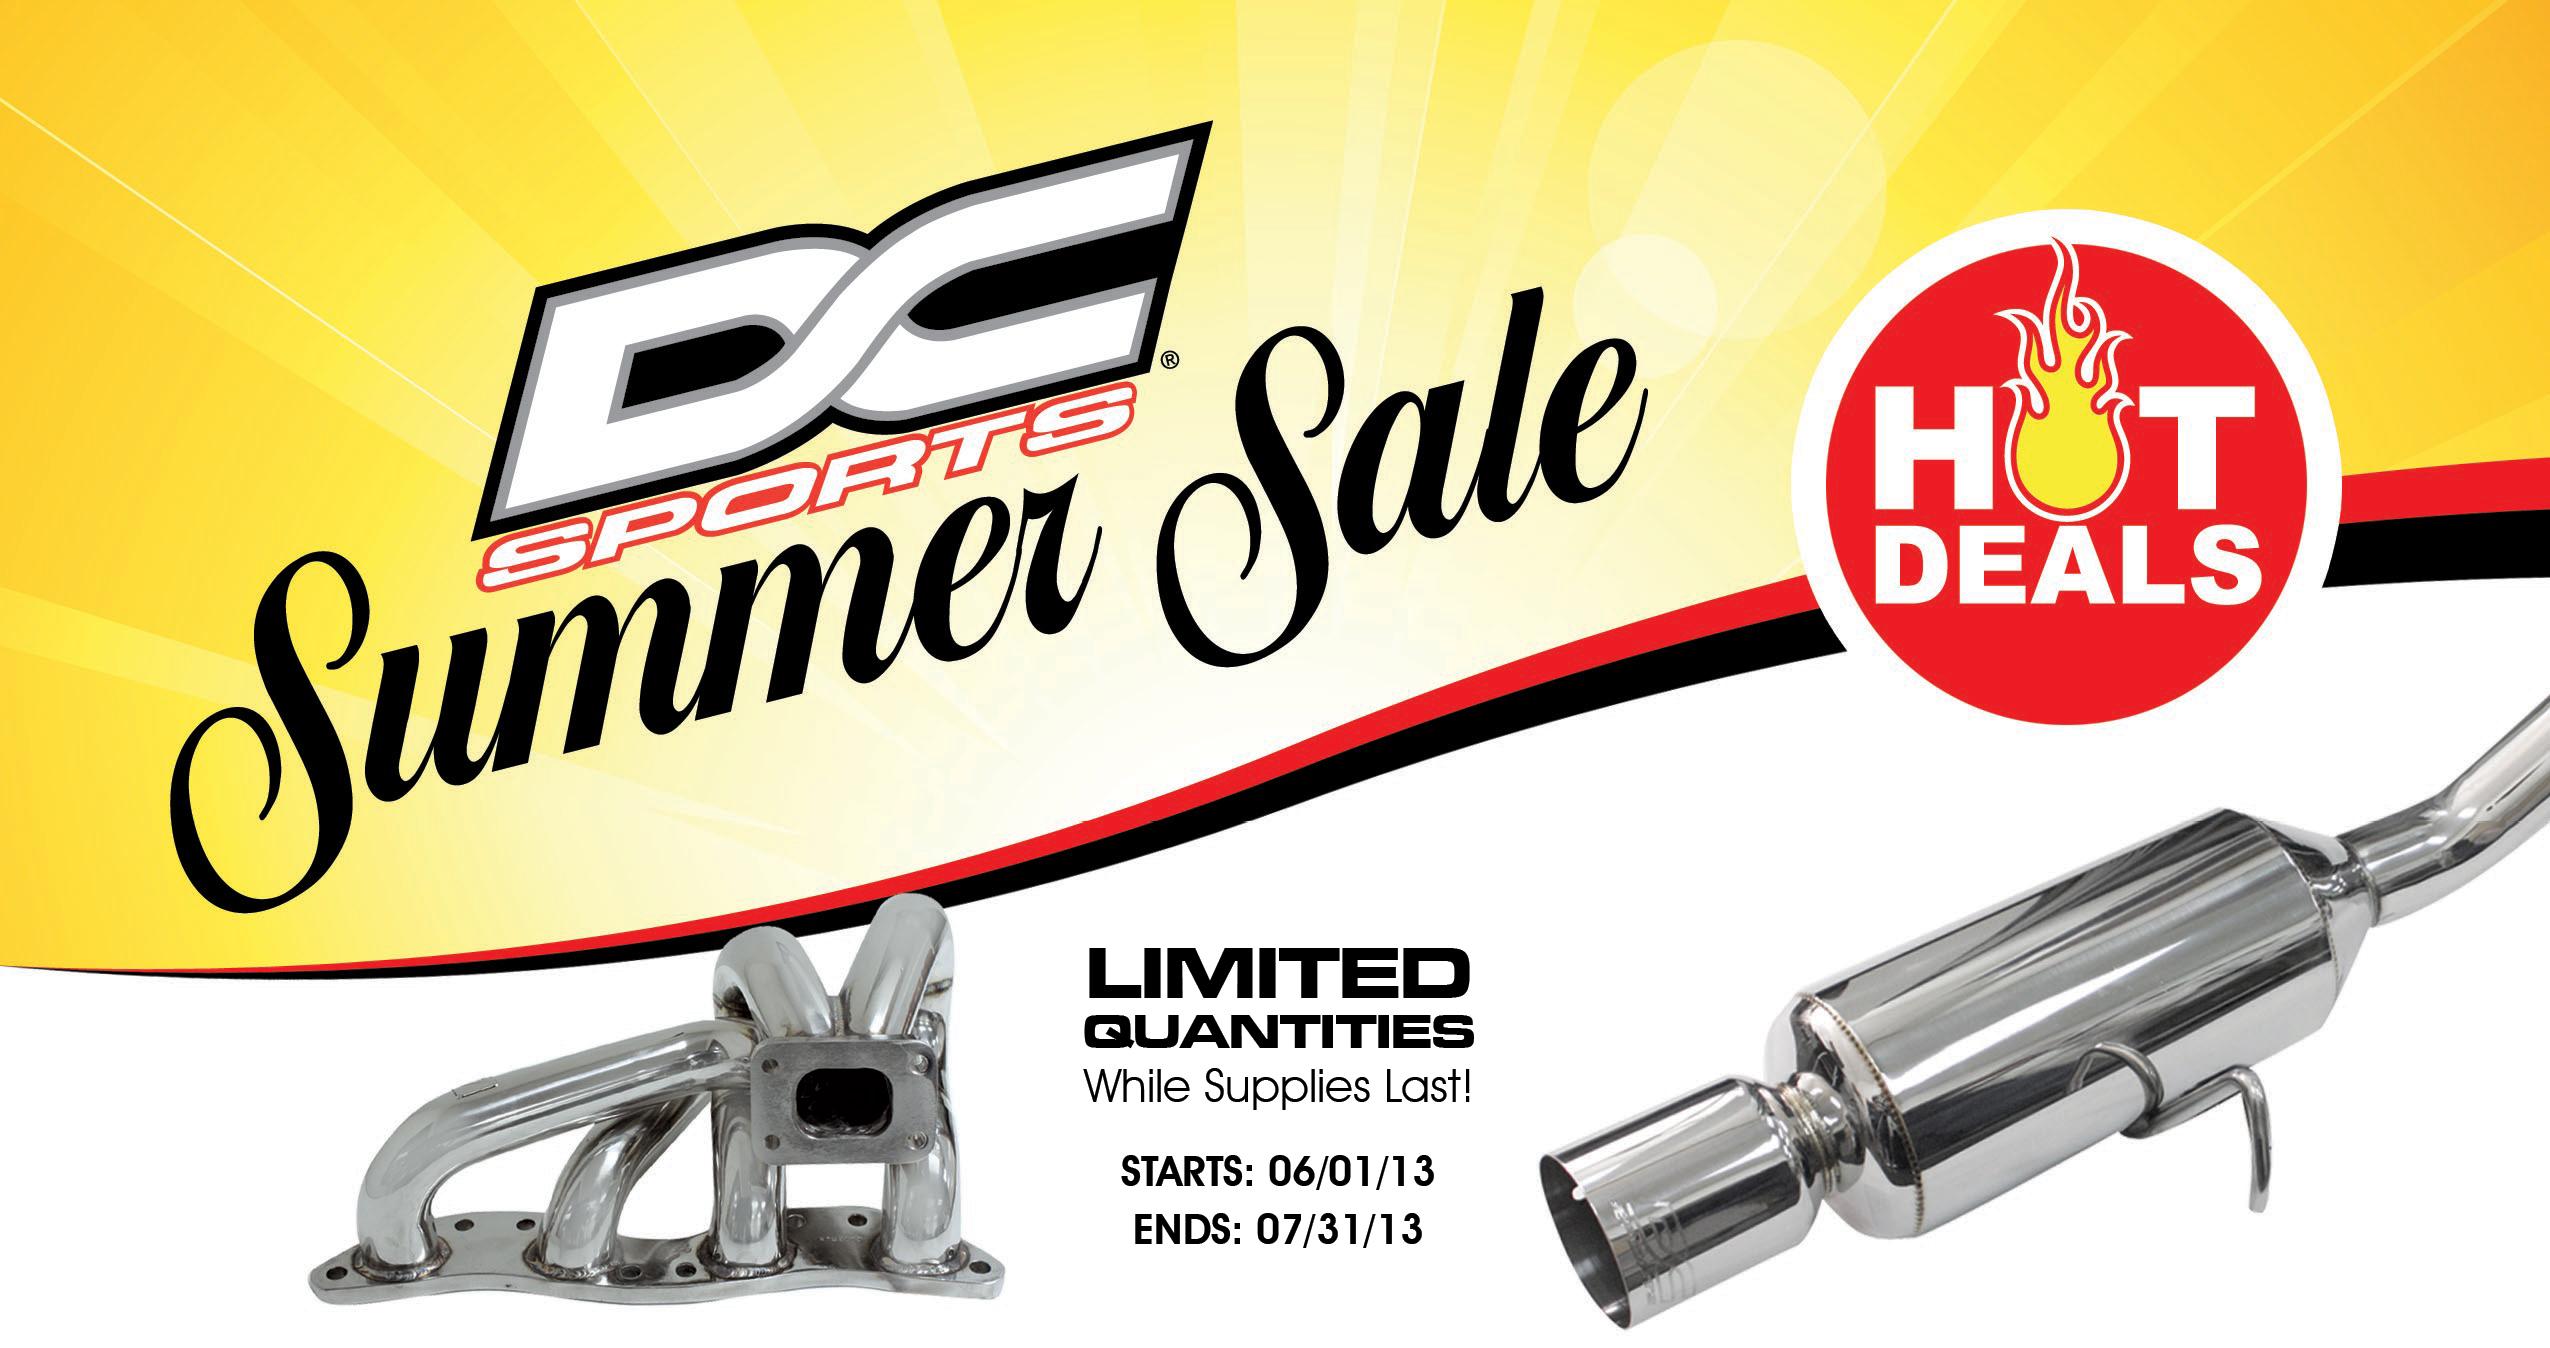 DC SPORTS: Summer Sale